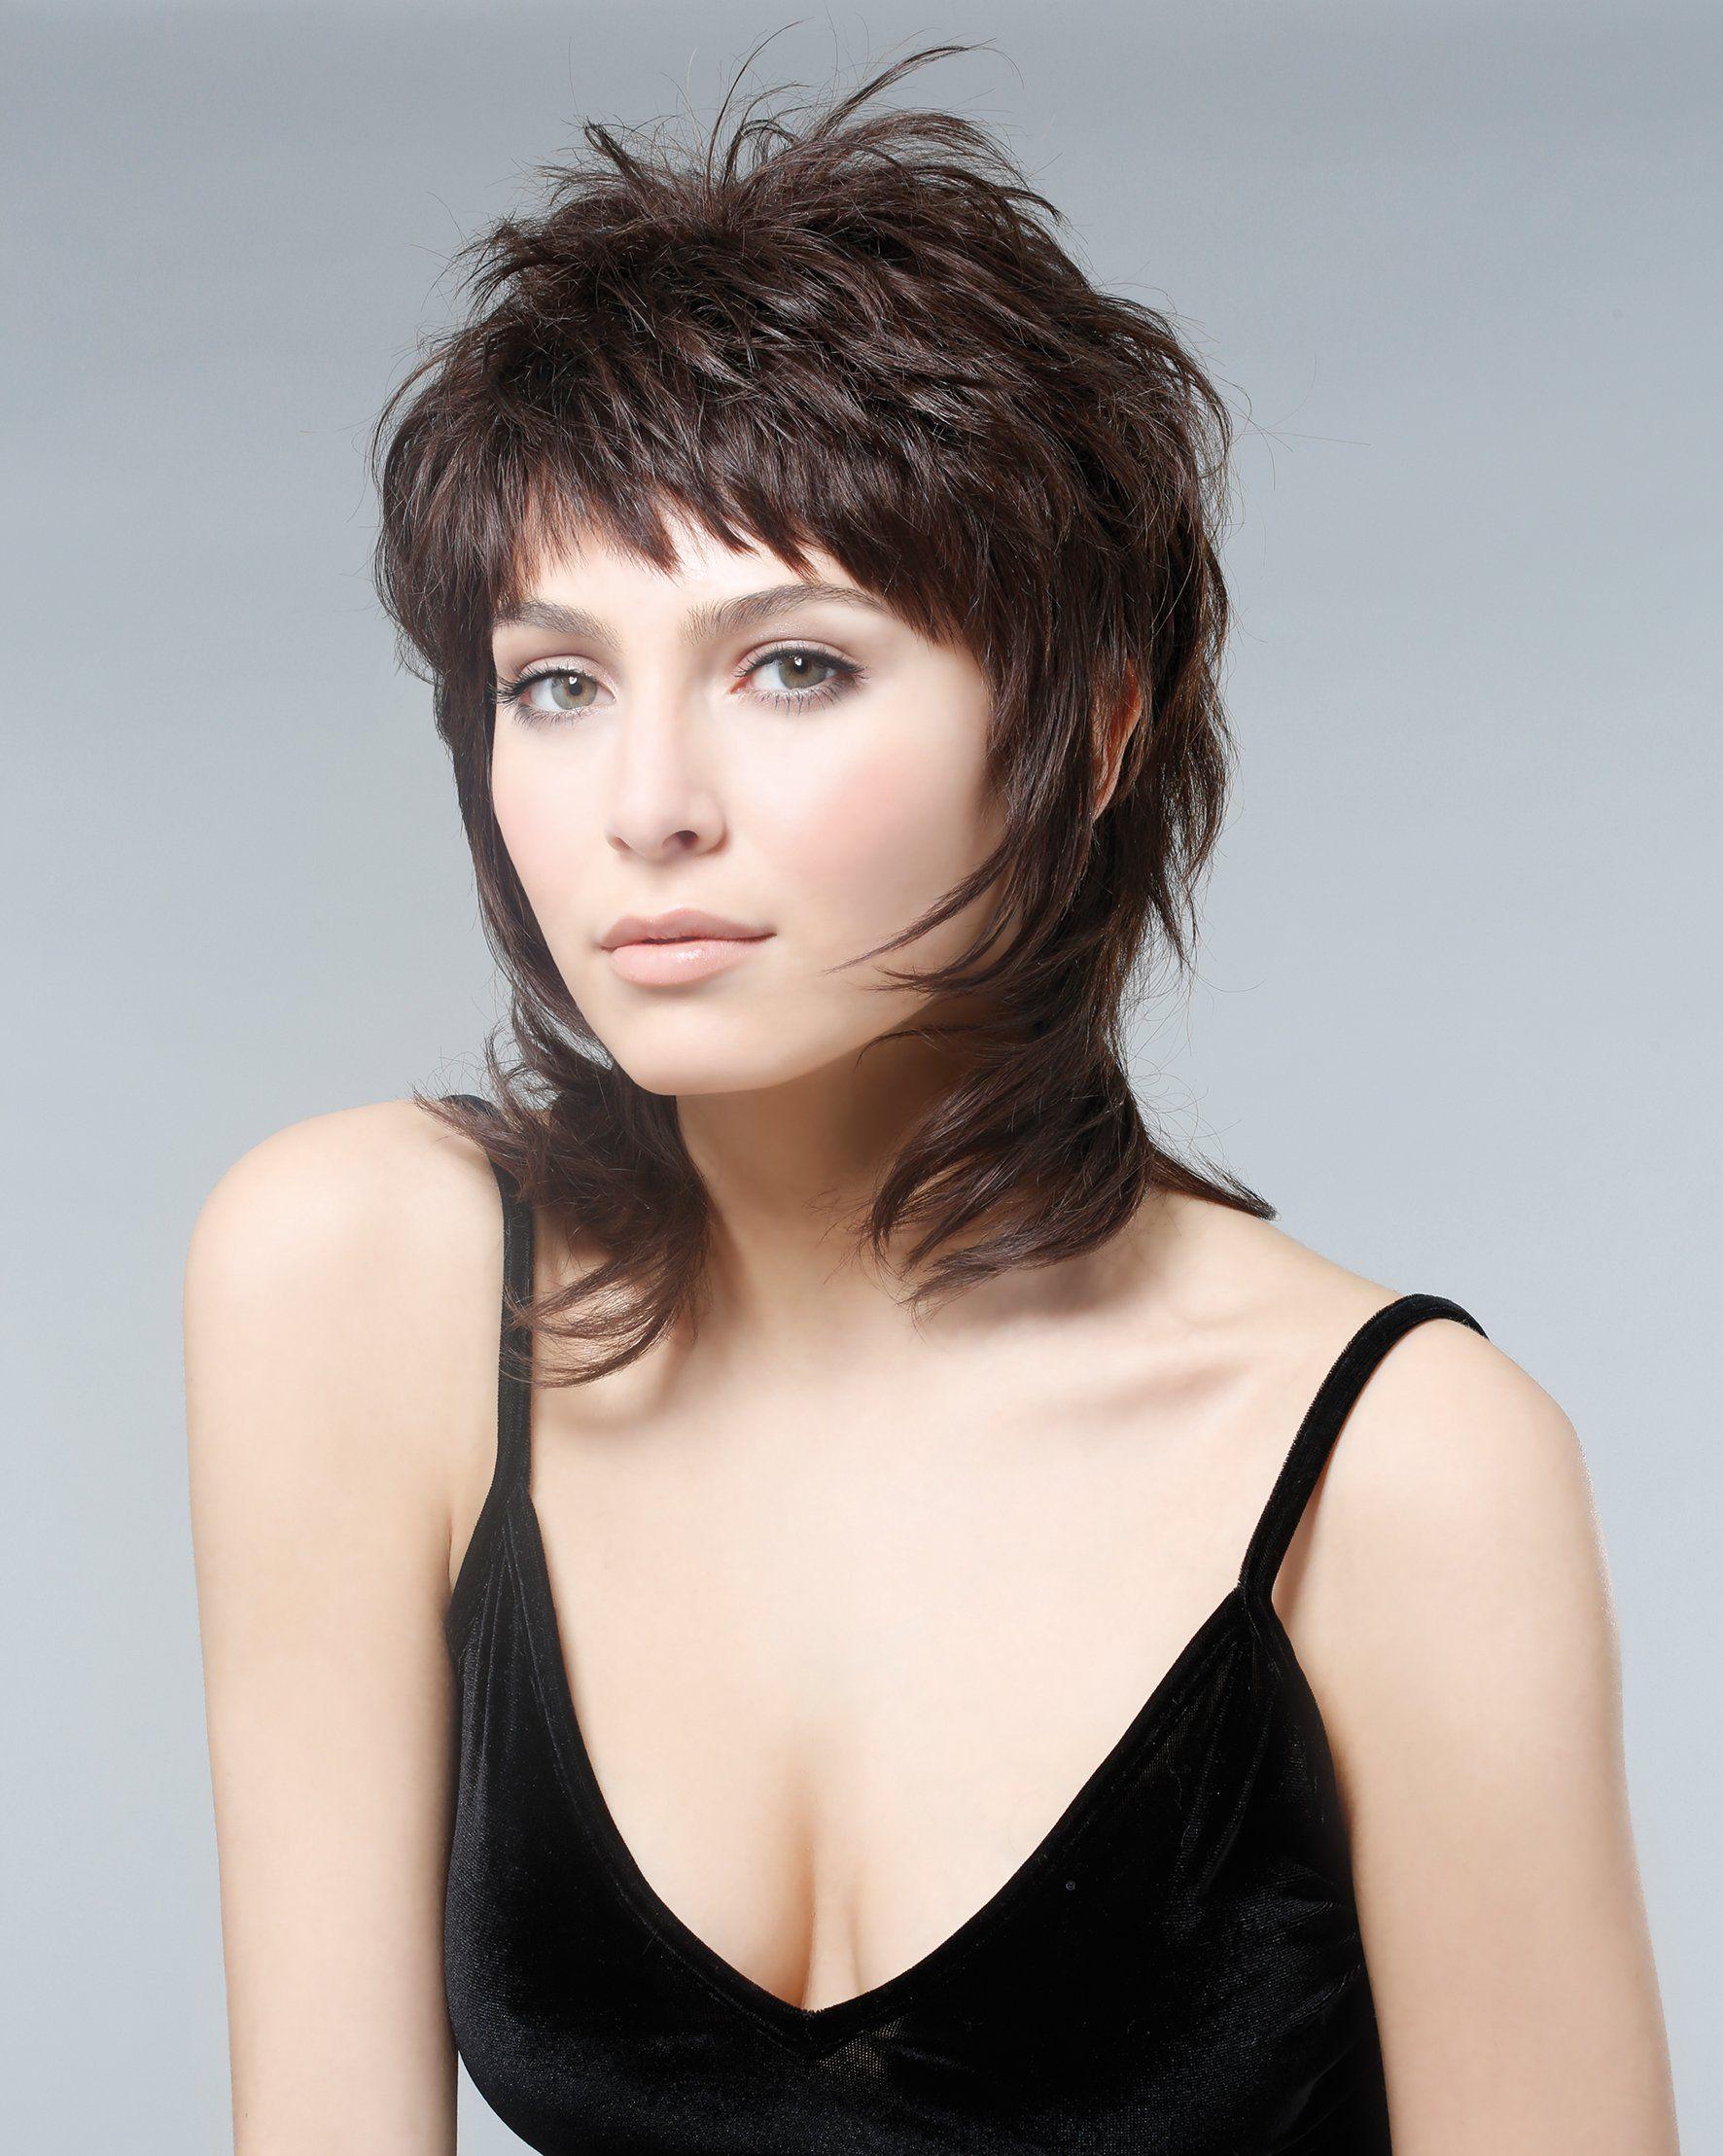 coiffure courte femme pinterest